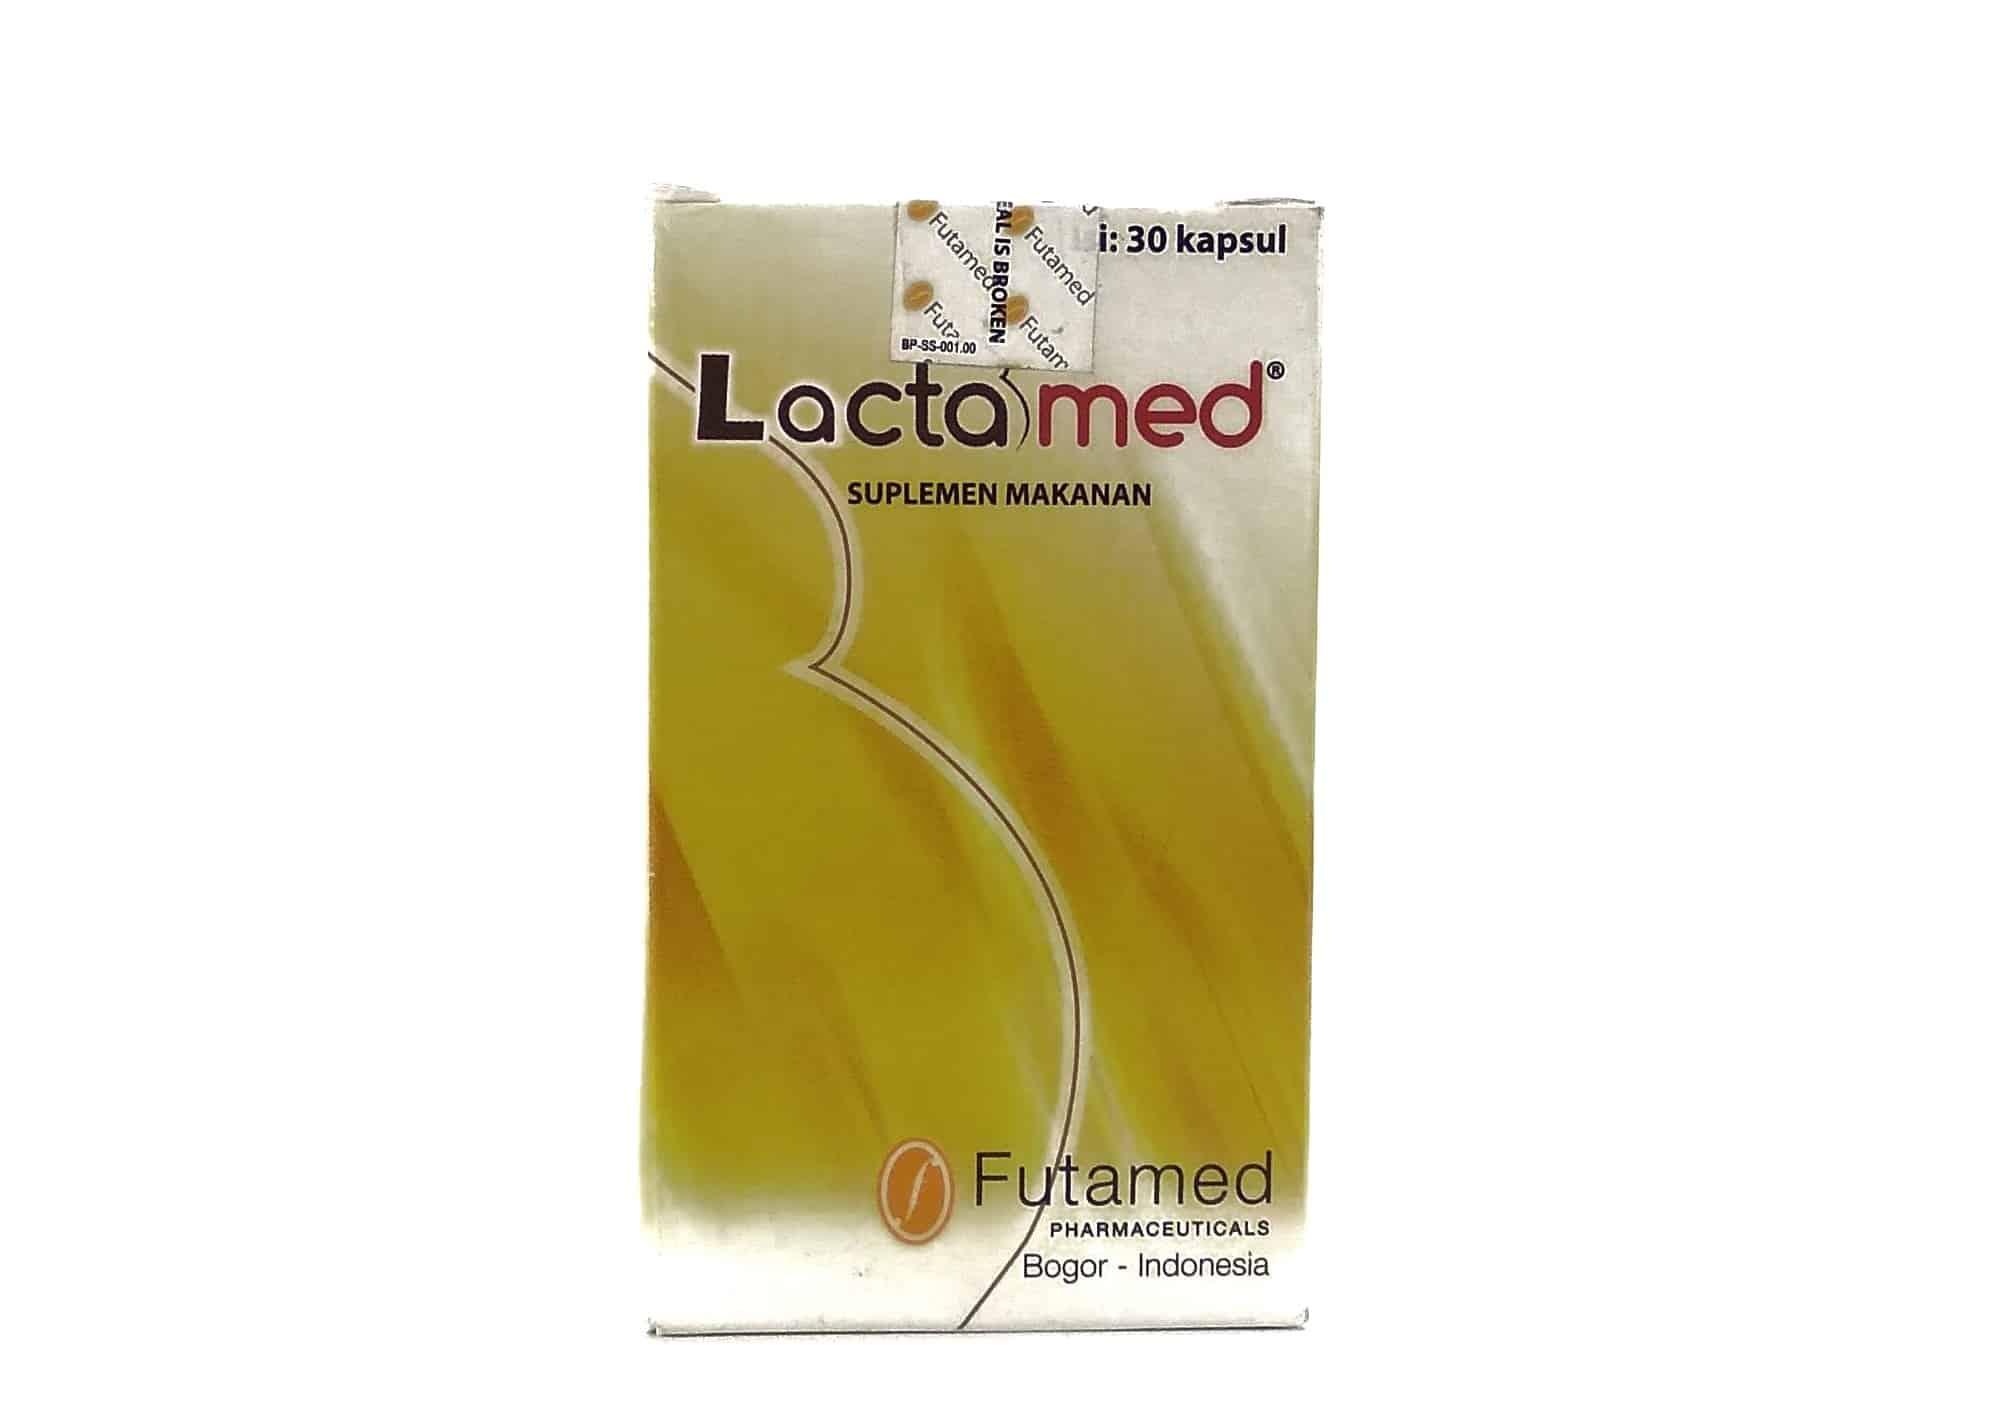 Lactamed-Vitamin